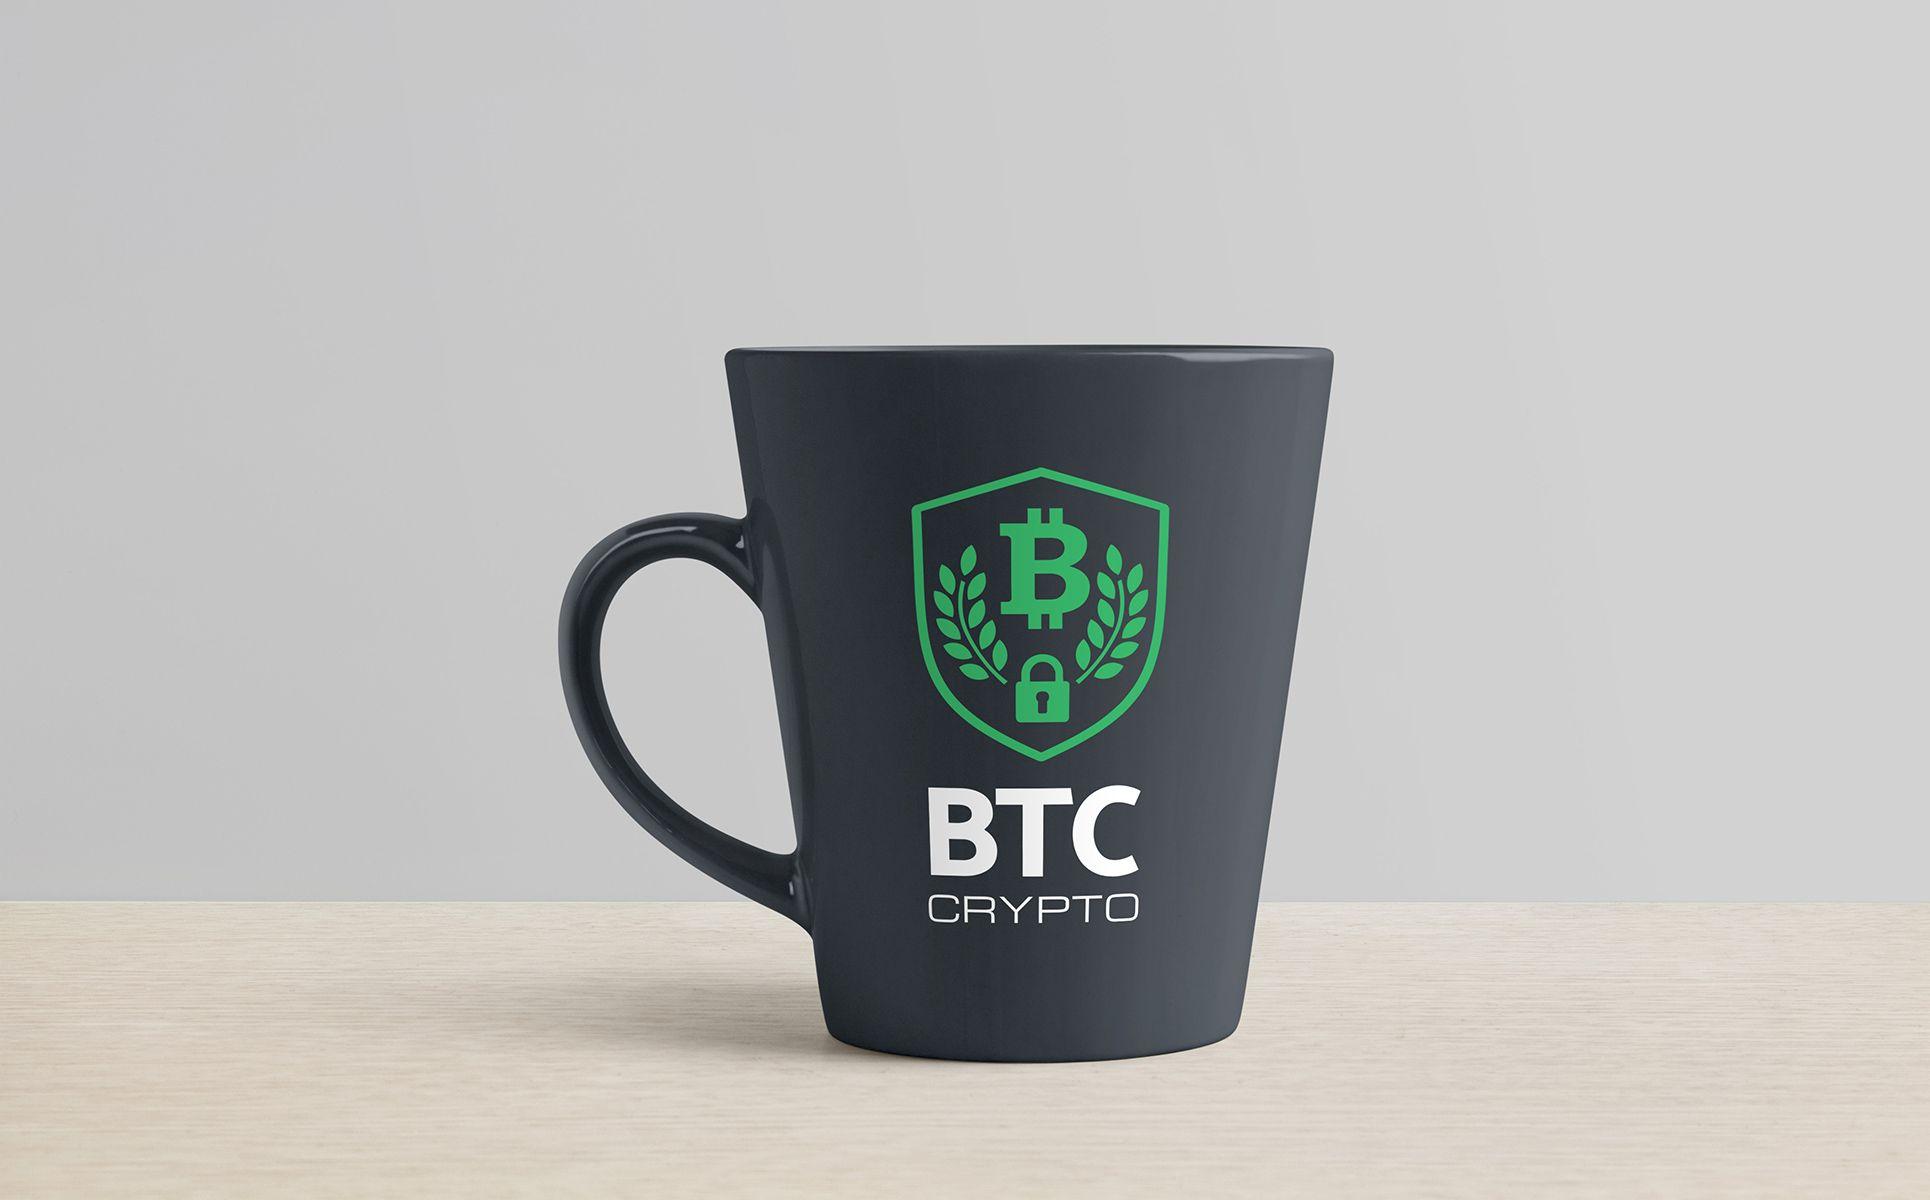 btc trading company)